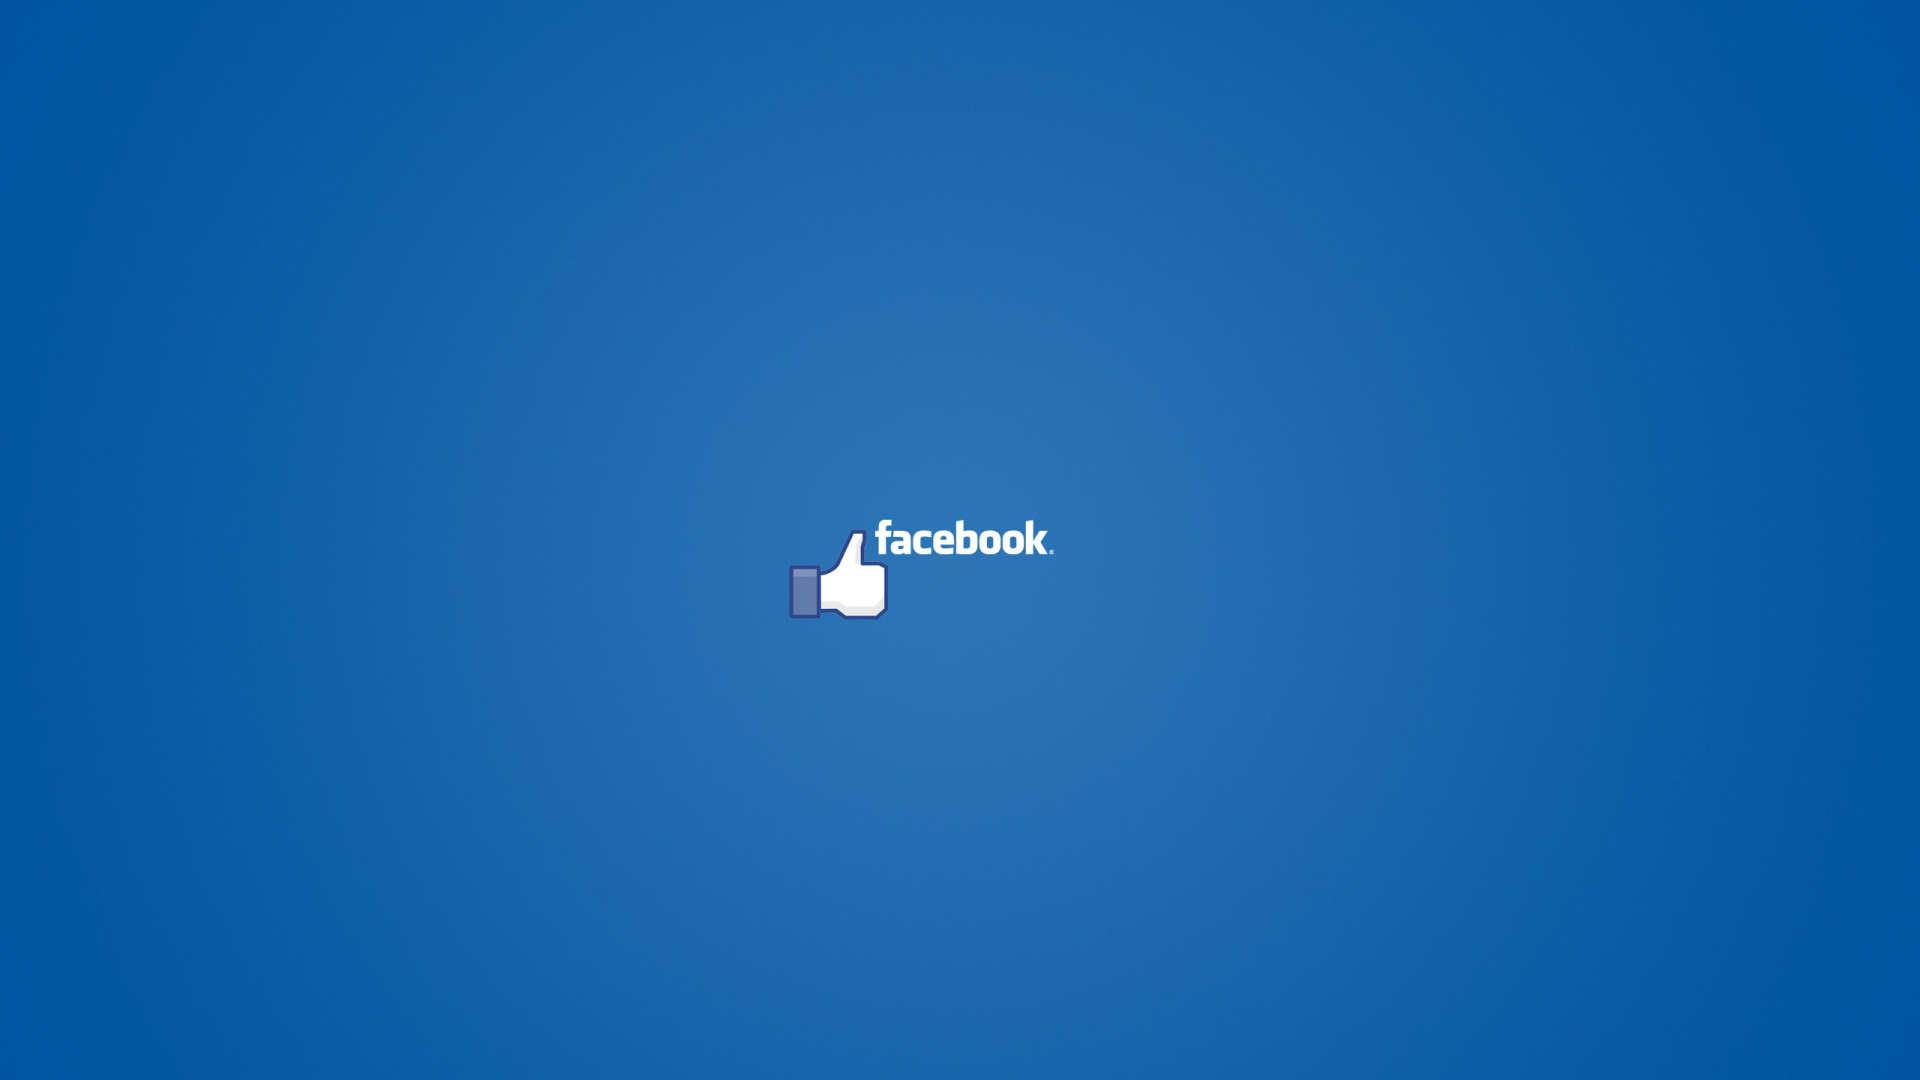 description facebook wallpaper is - photo #12